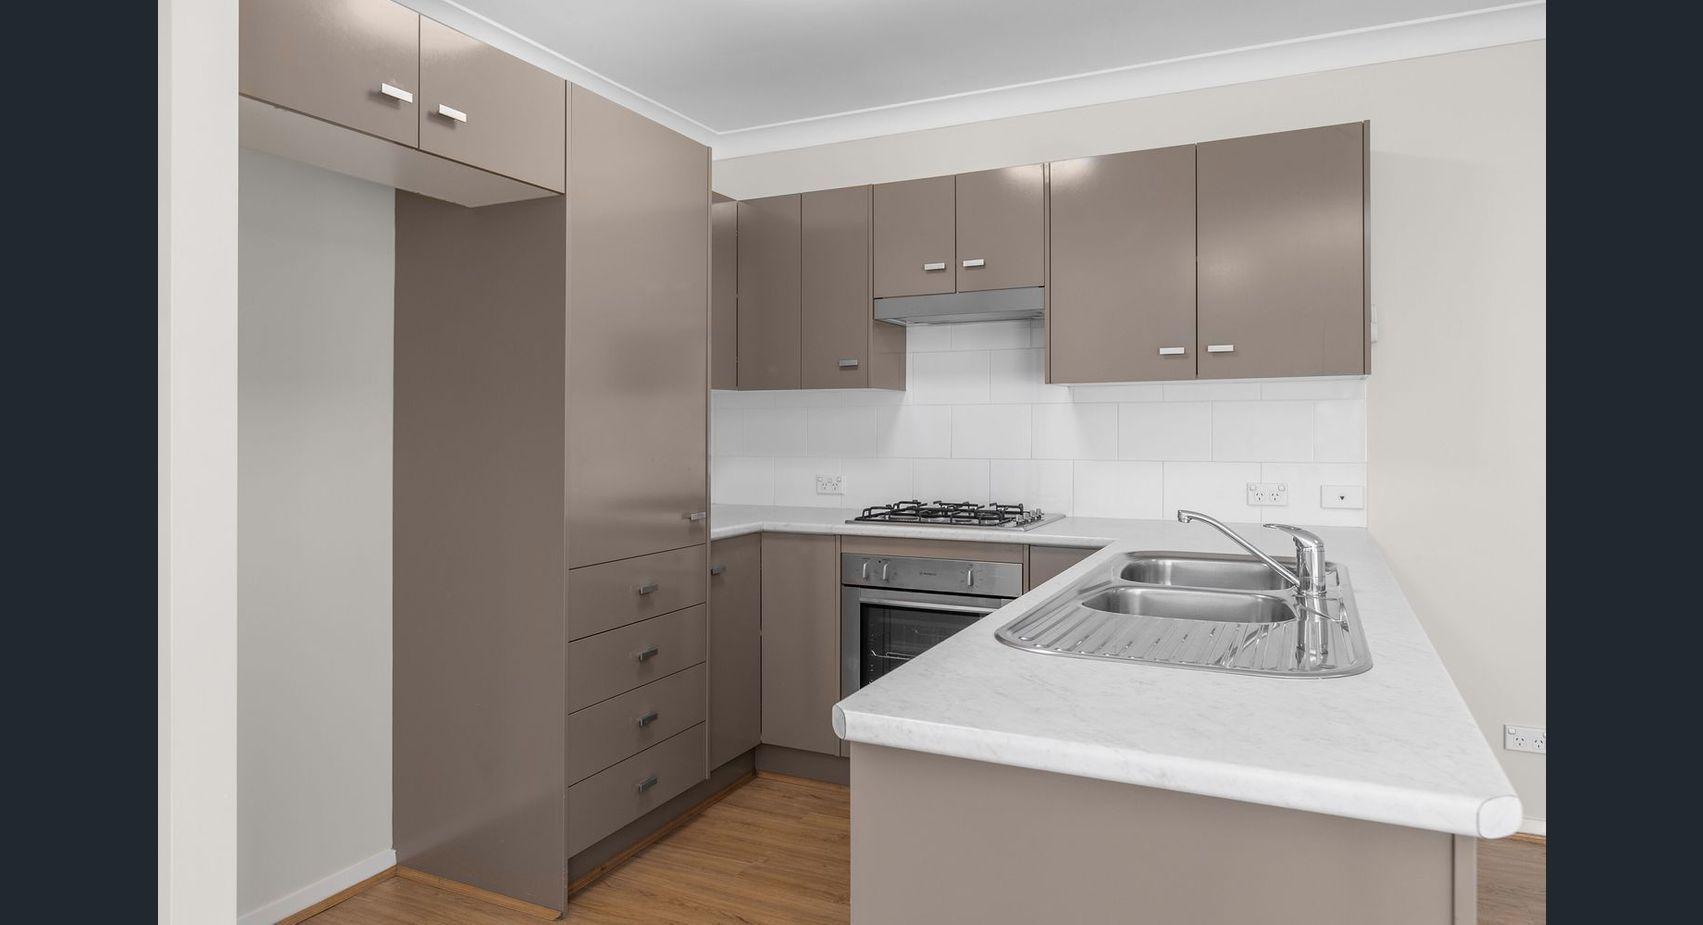 3/17a Raymond Terrace Road, East Maitland NSW 2323, Image 2